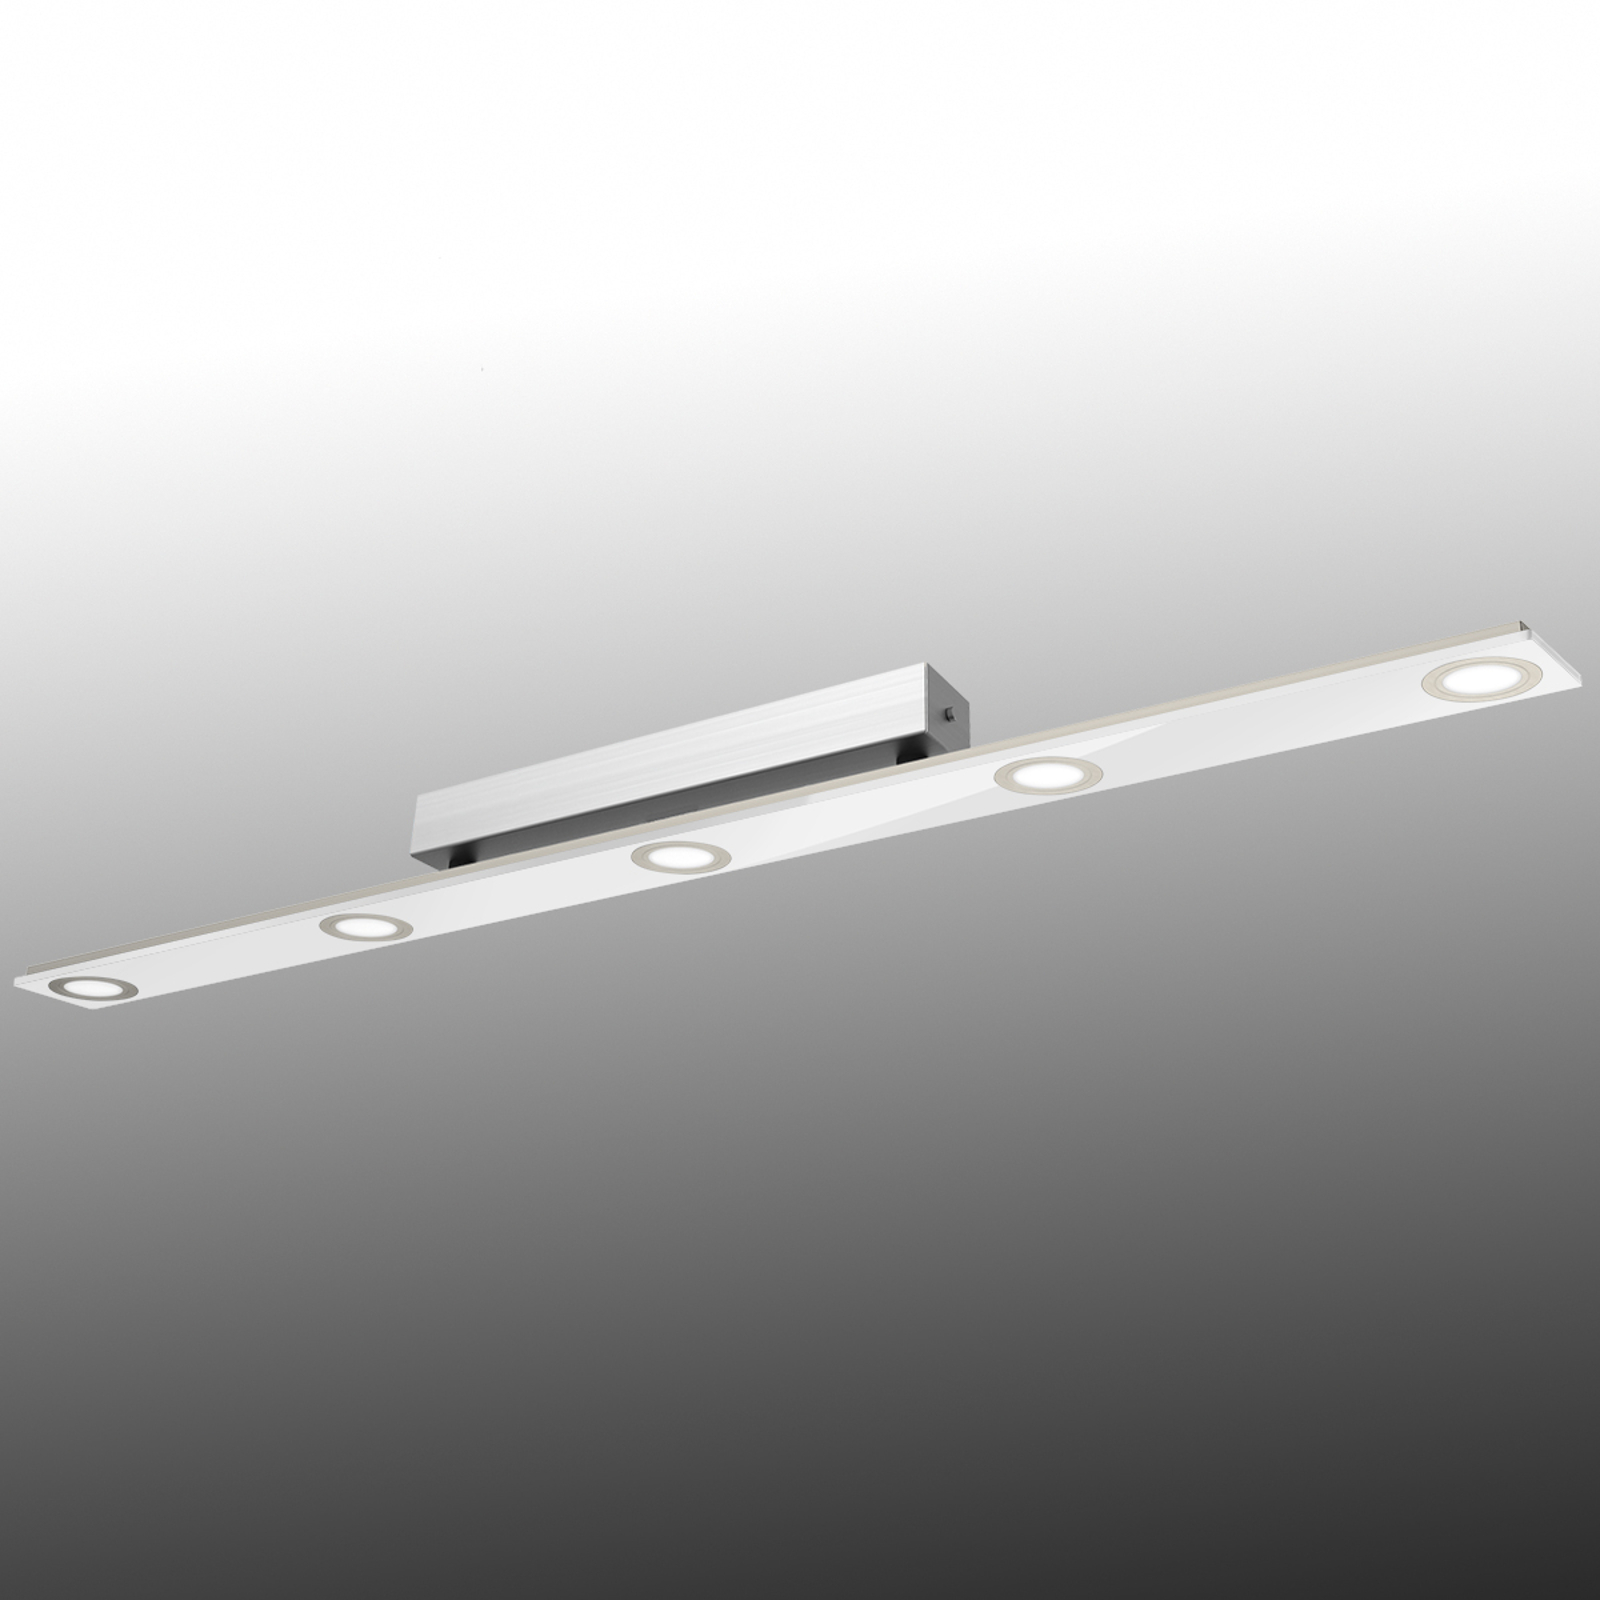 podłużna lampa sufitowa LED Pano, biała